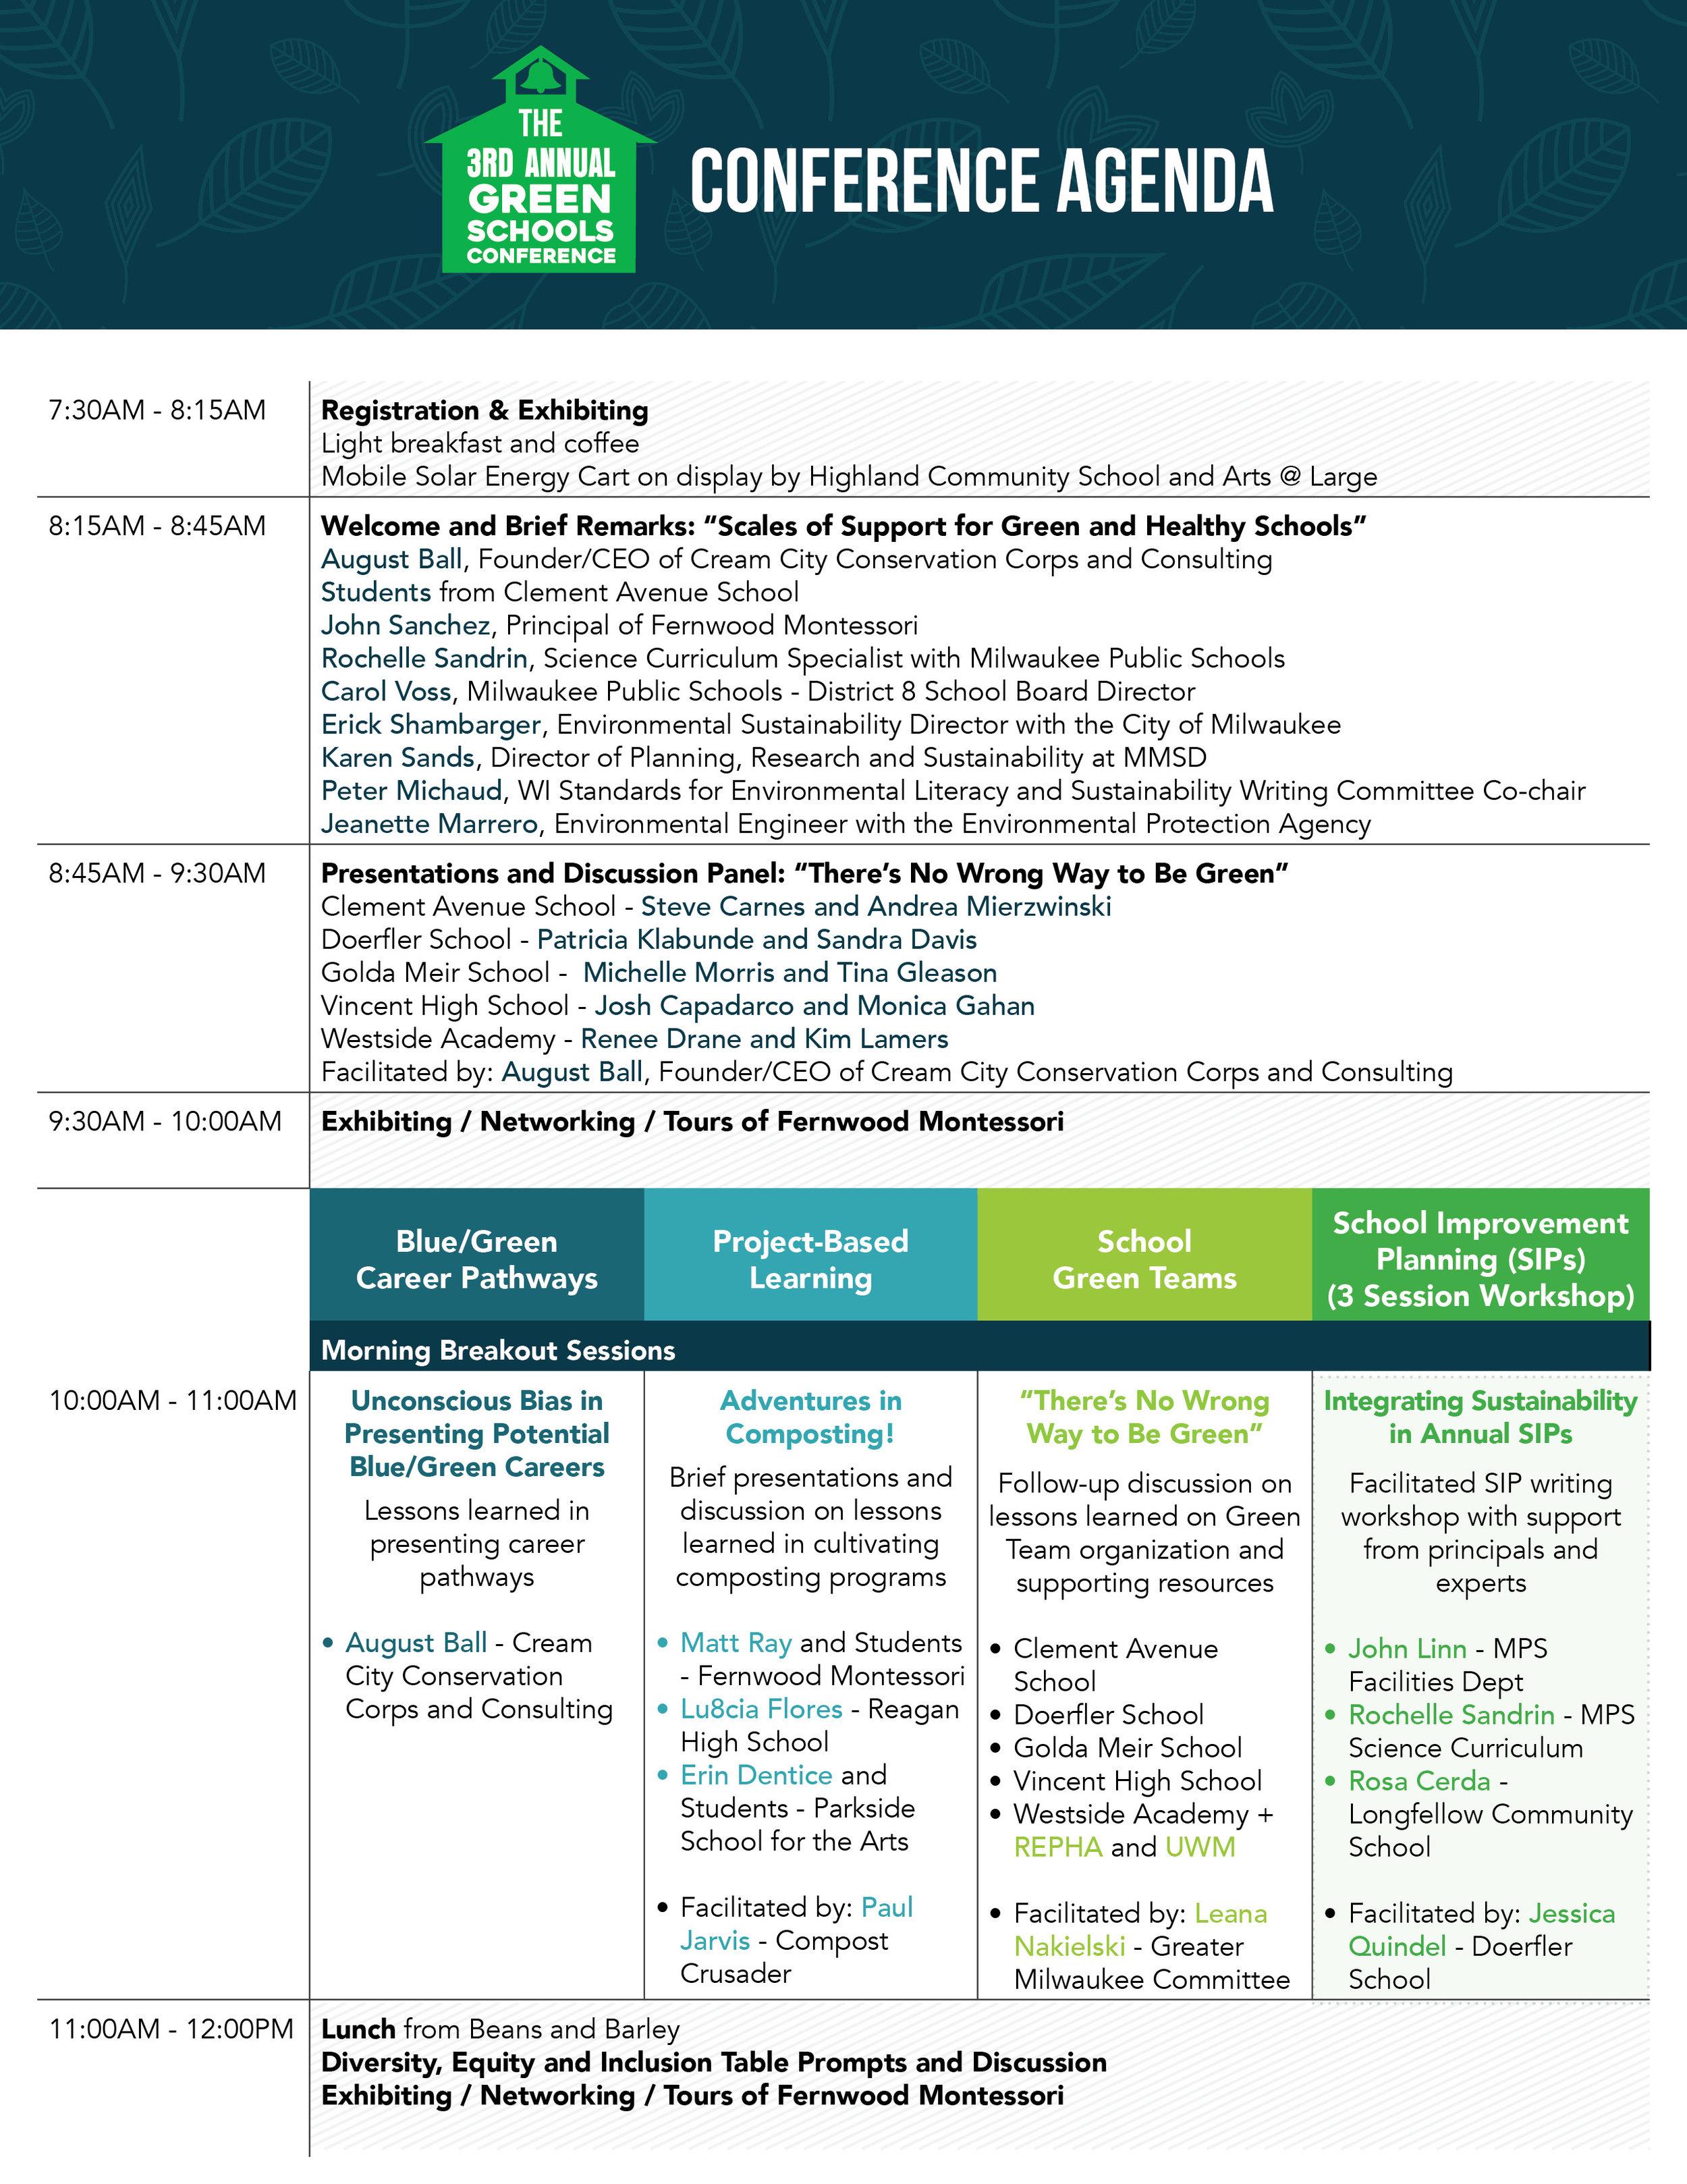 2018 Green Schools Conference Agenda.jpg